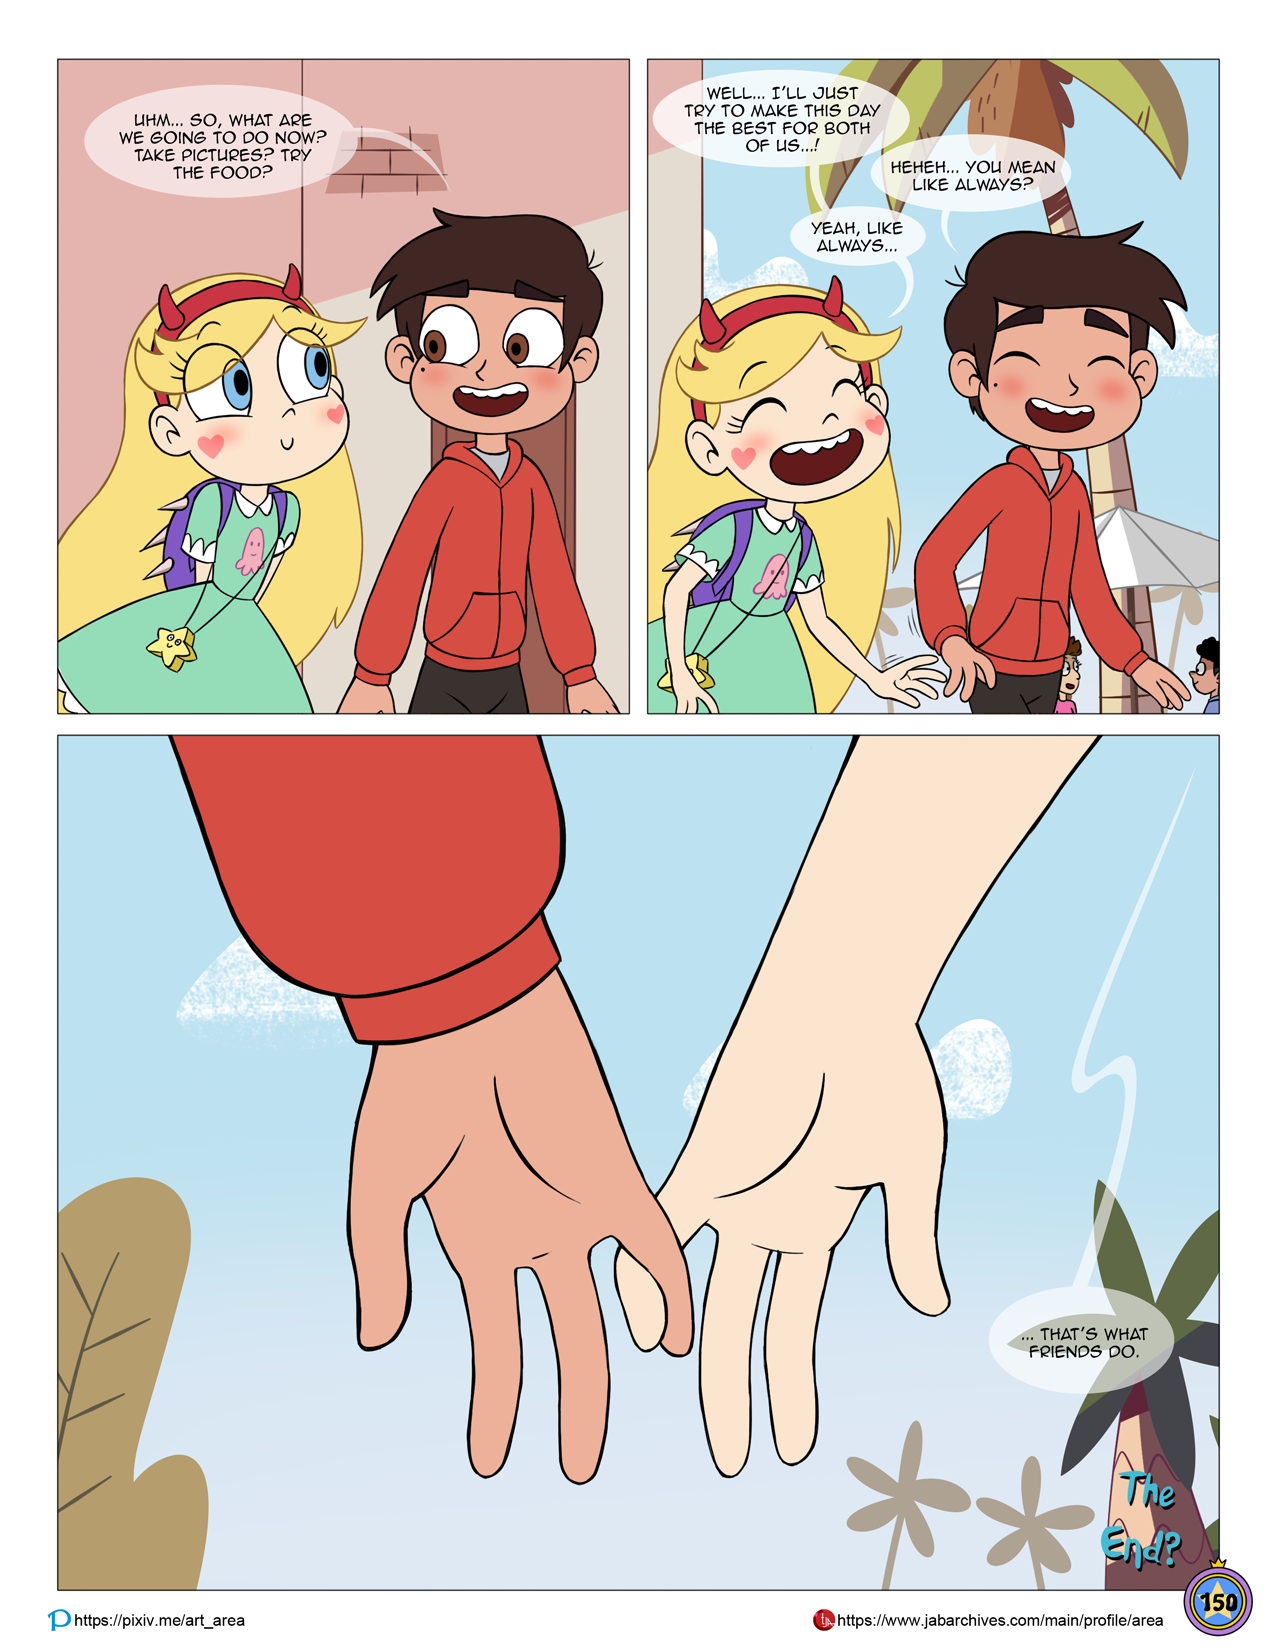 Between friends porn comic picture 150